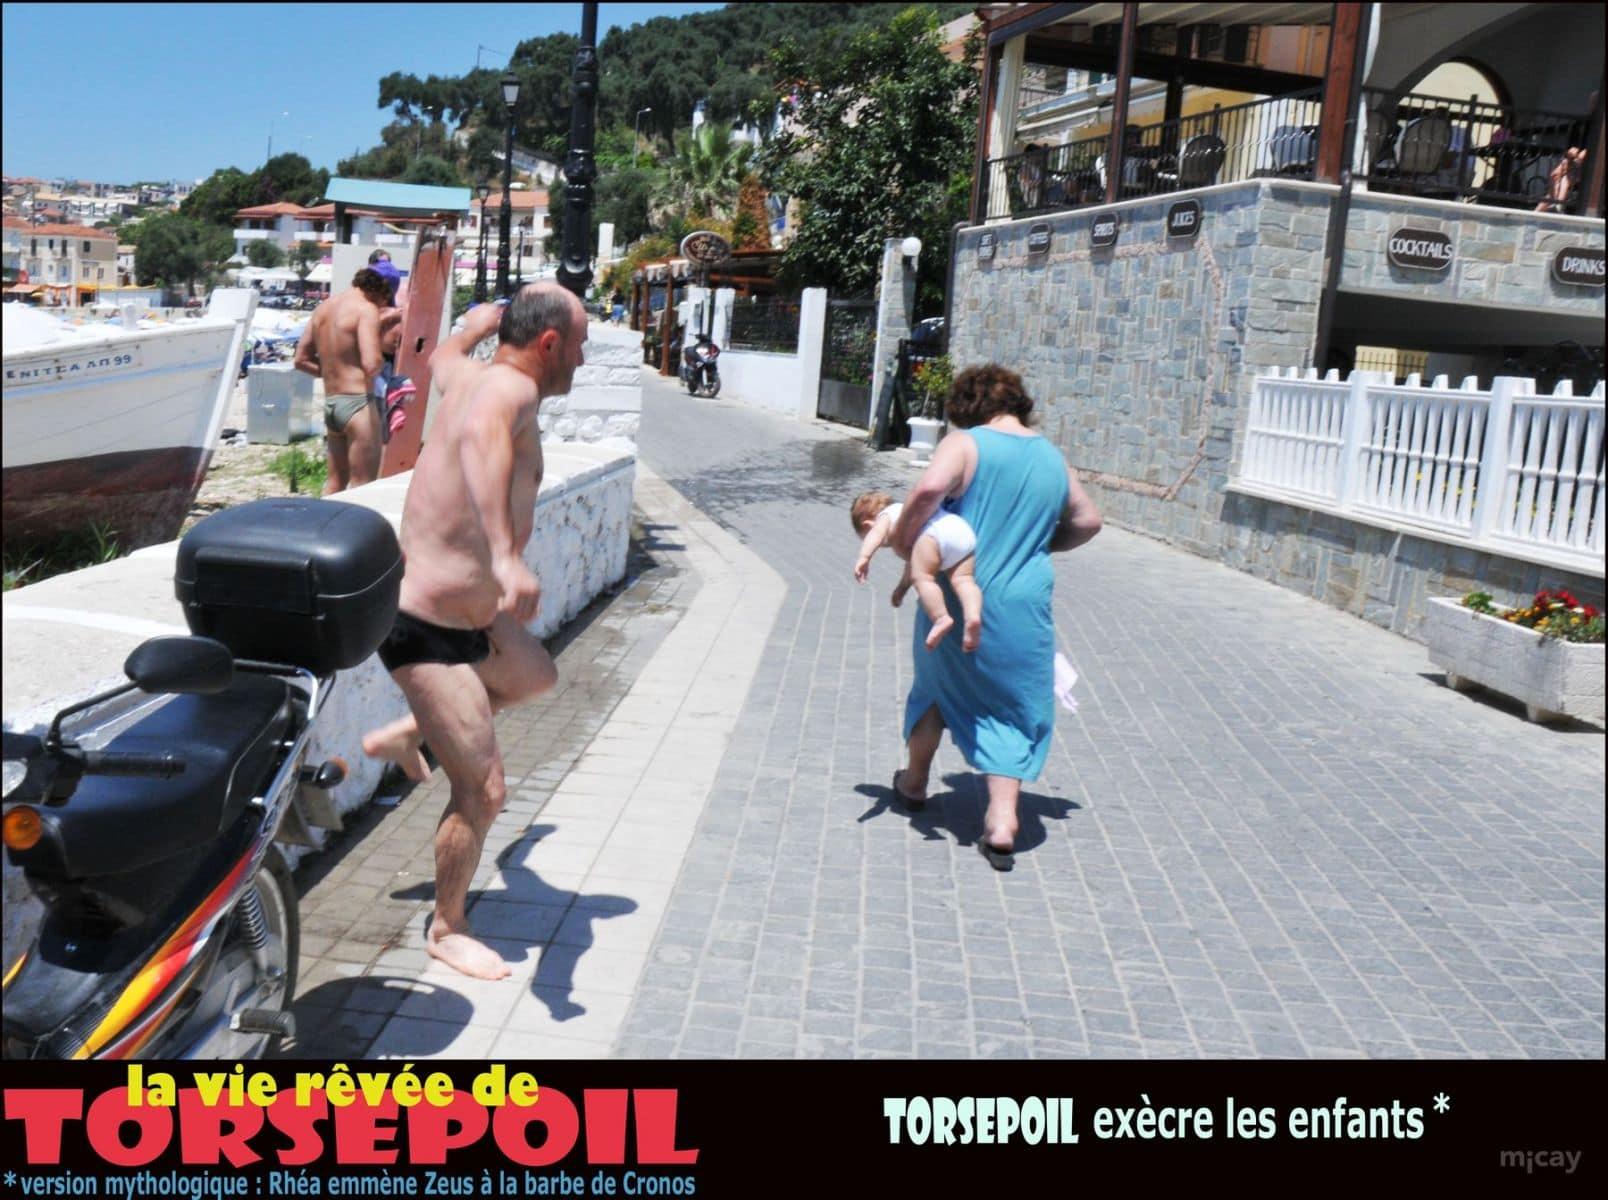 MichelAycaguer-Torsepoil-streetphotography-4